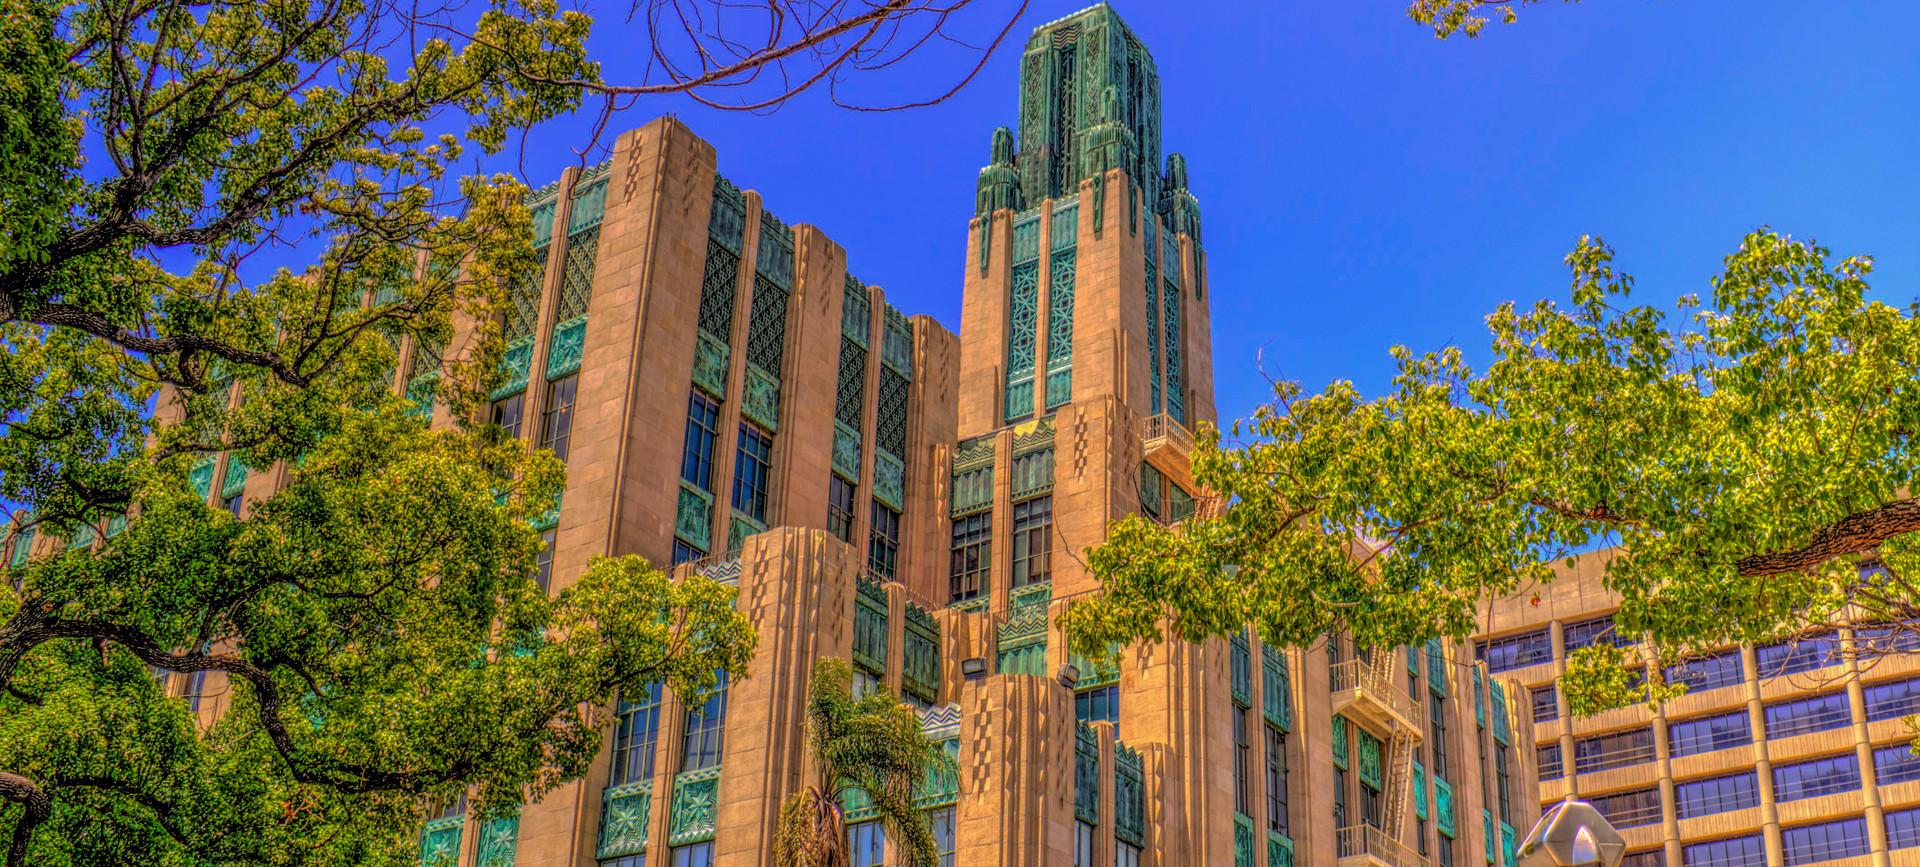 Bullocks Wilshire Los Angeles